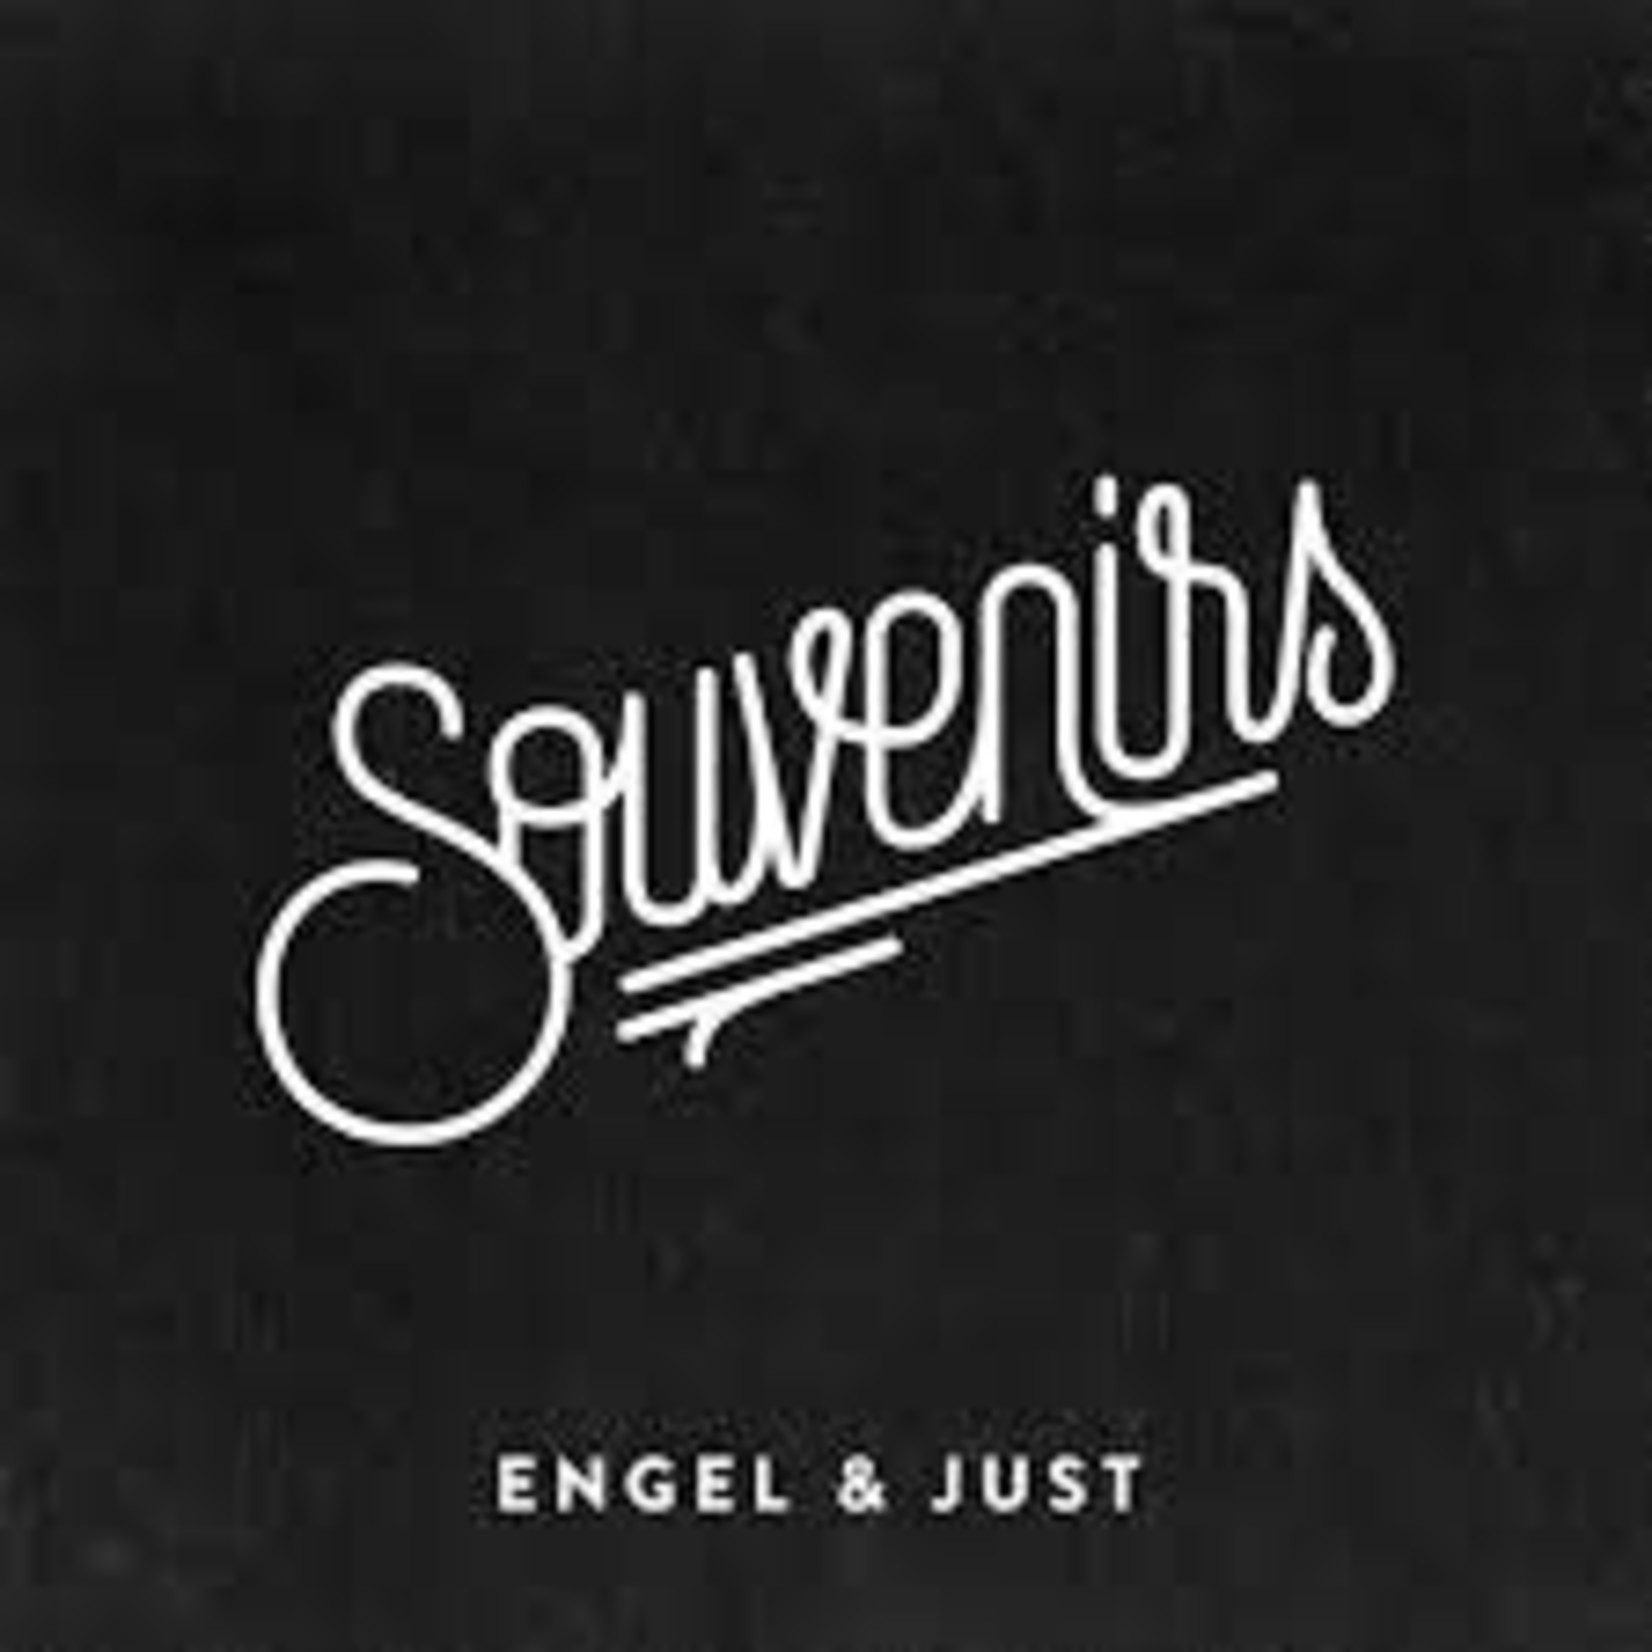 ENGEL & JUST - Souvenirs  (CD)